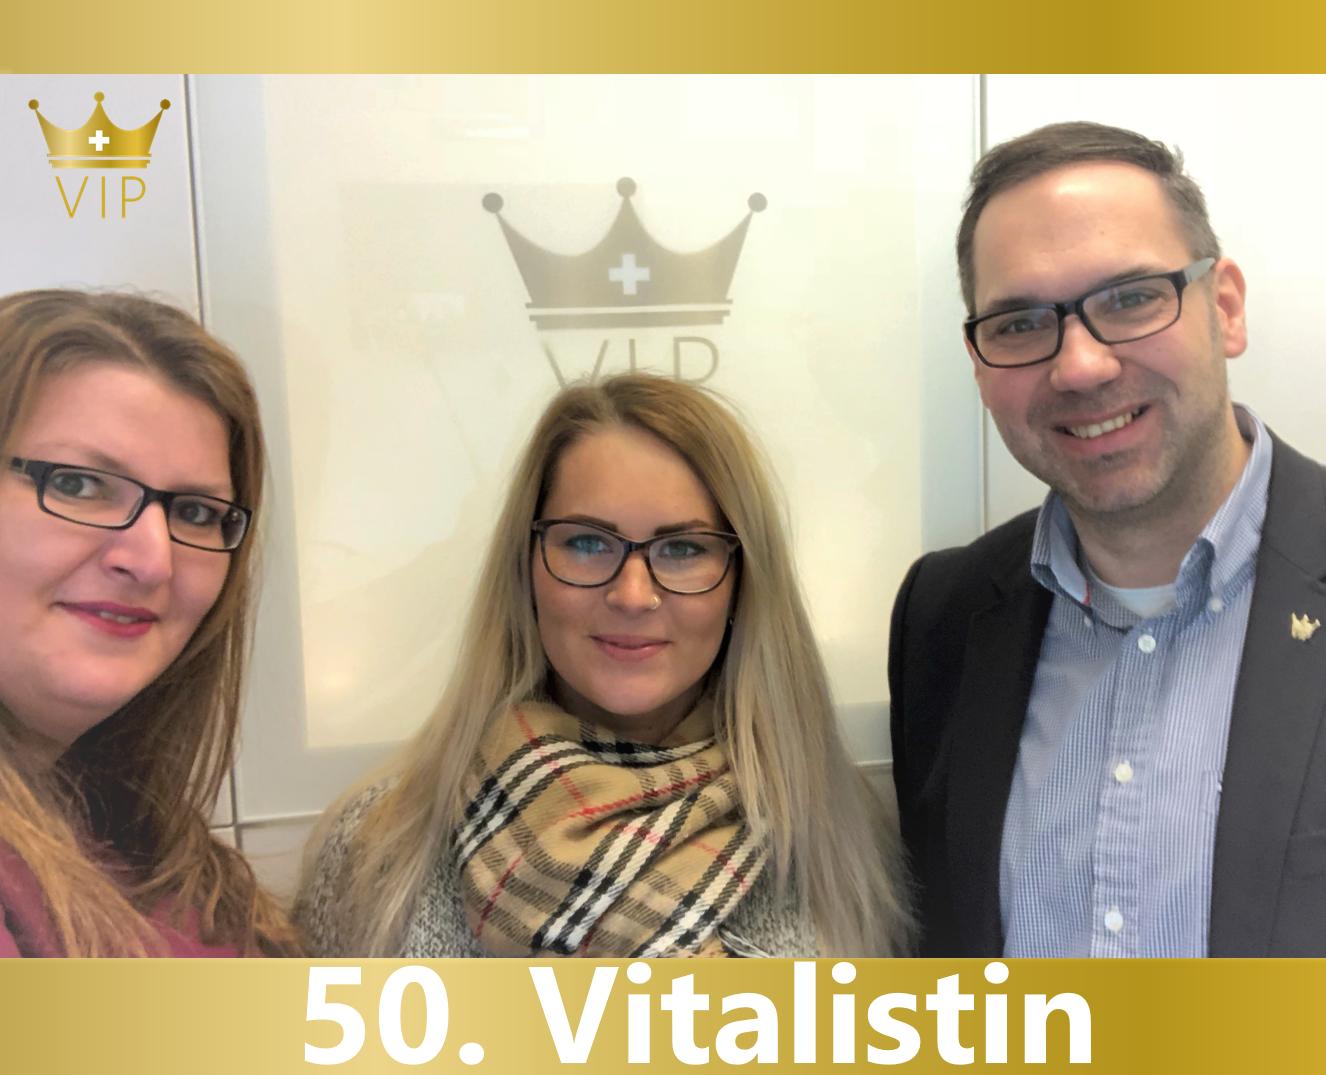 VIP GmbH Vitalisten - Intensivpflege